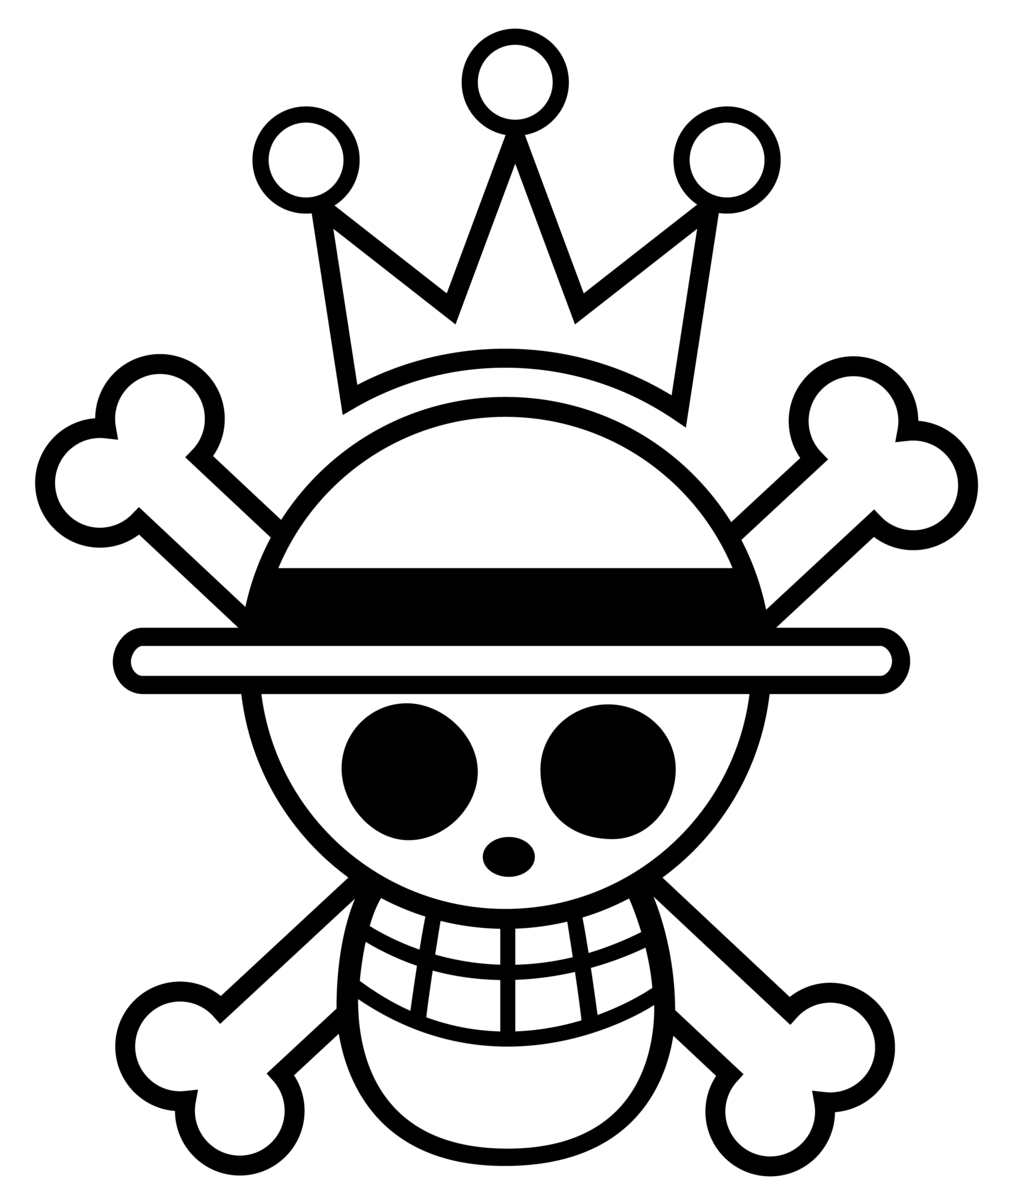 One Piece Symbols